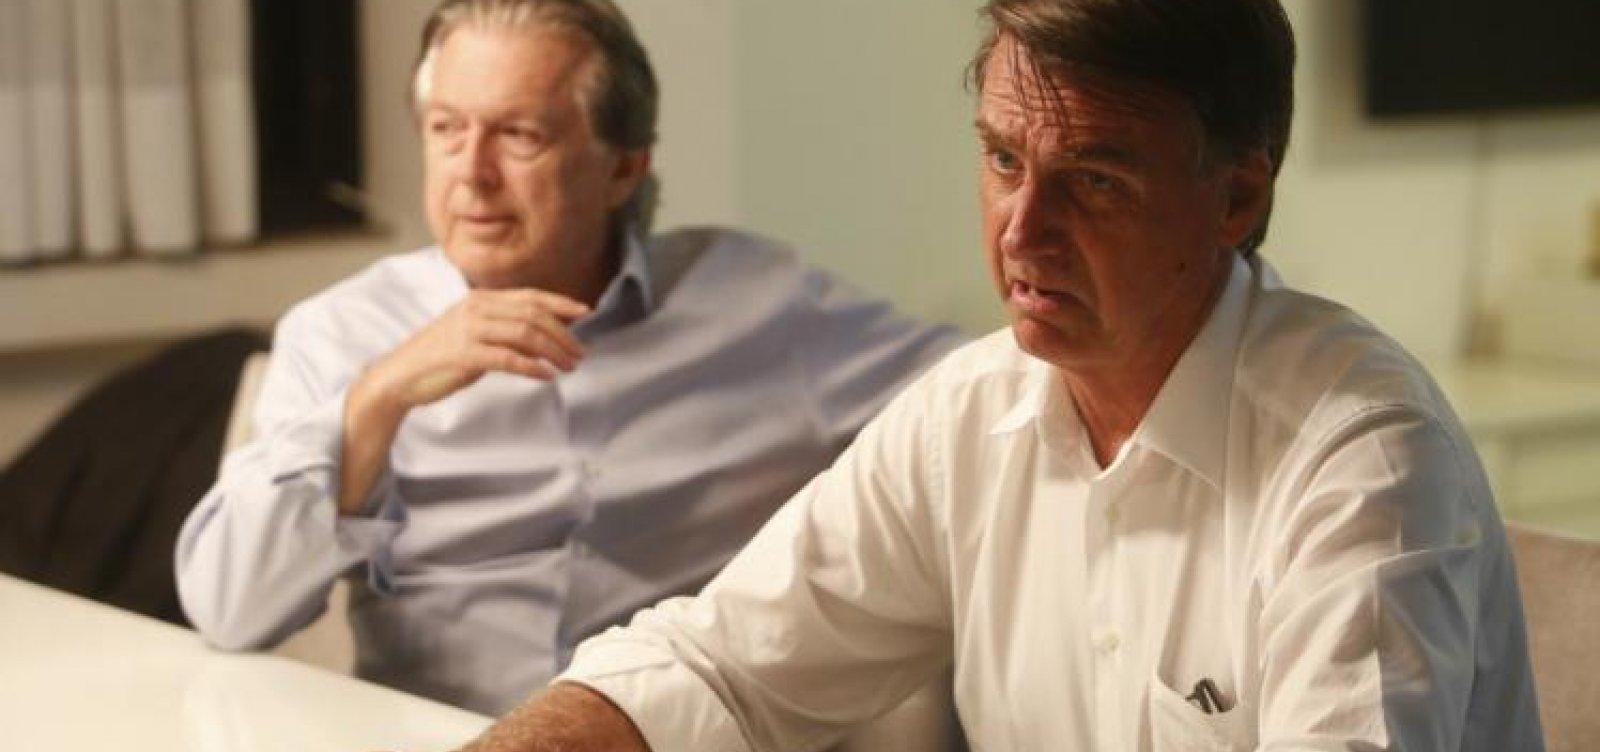 [Partido de Bolsonaro criou candidata laranja para usar verba pública de R$ 400 mil]